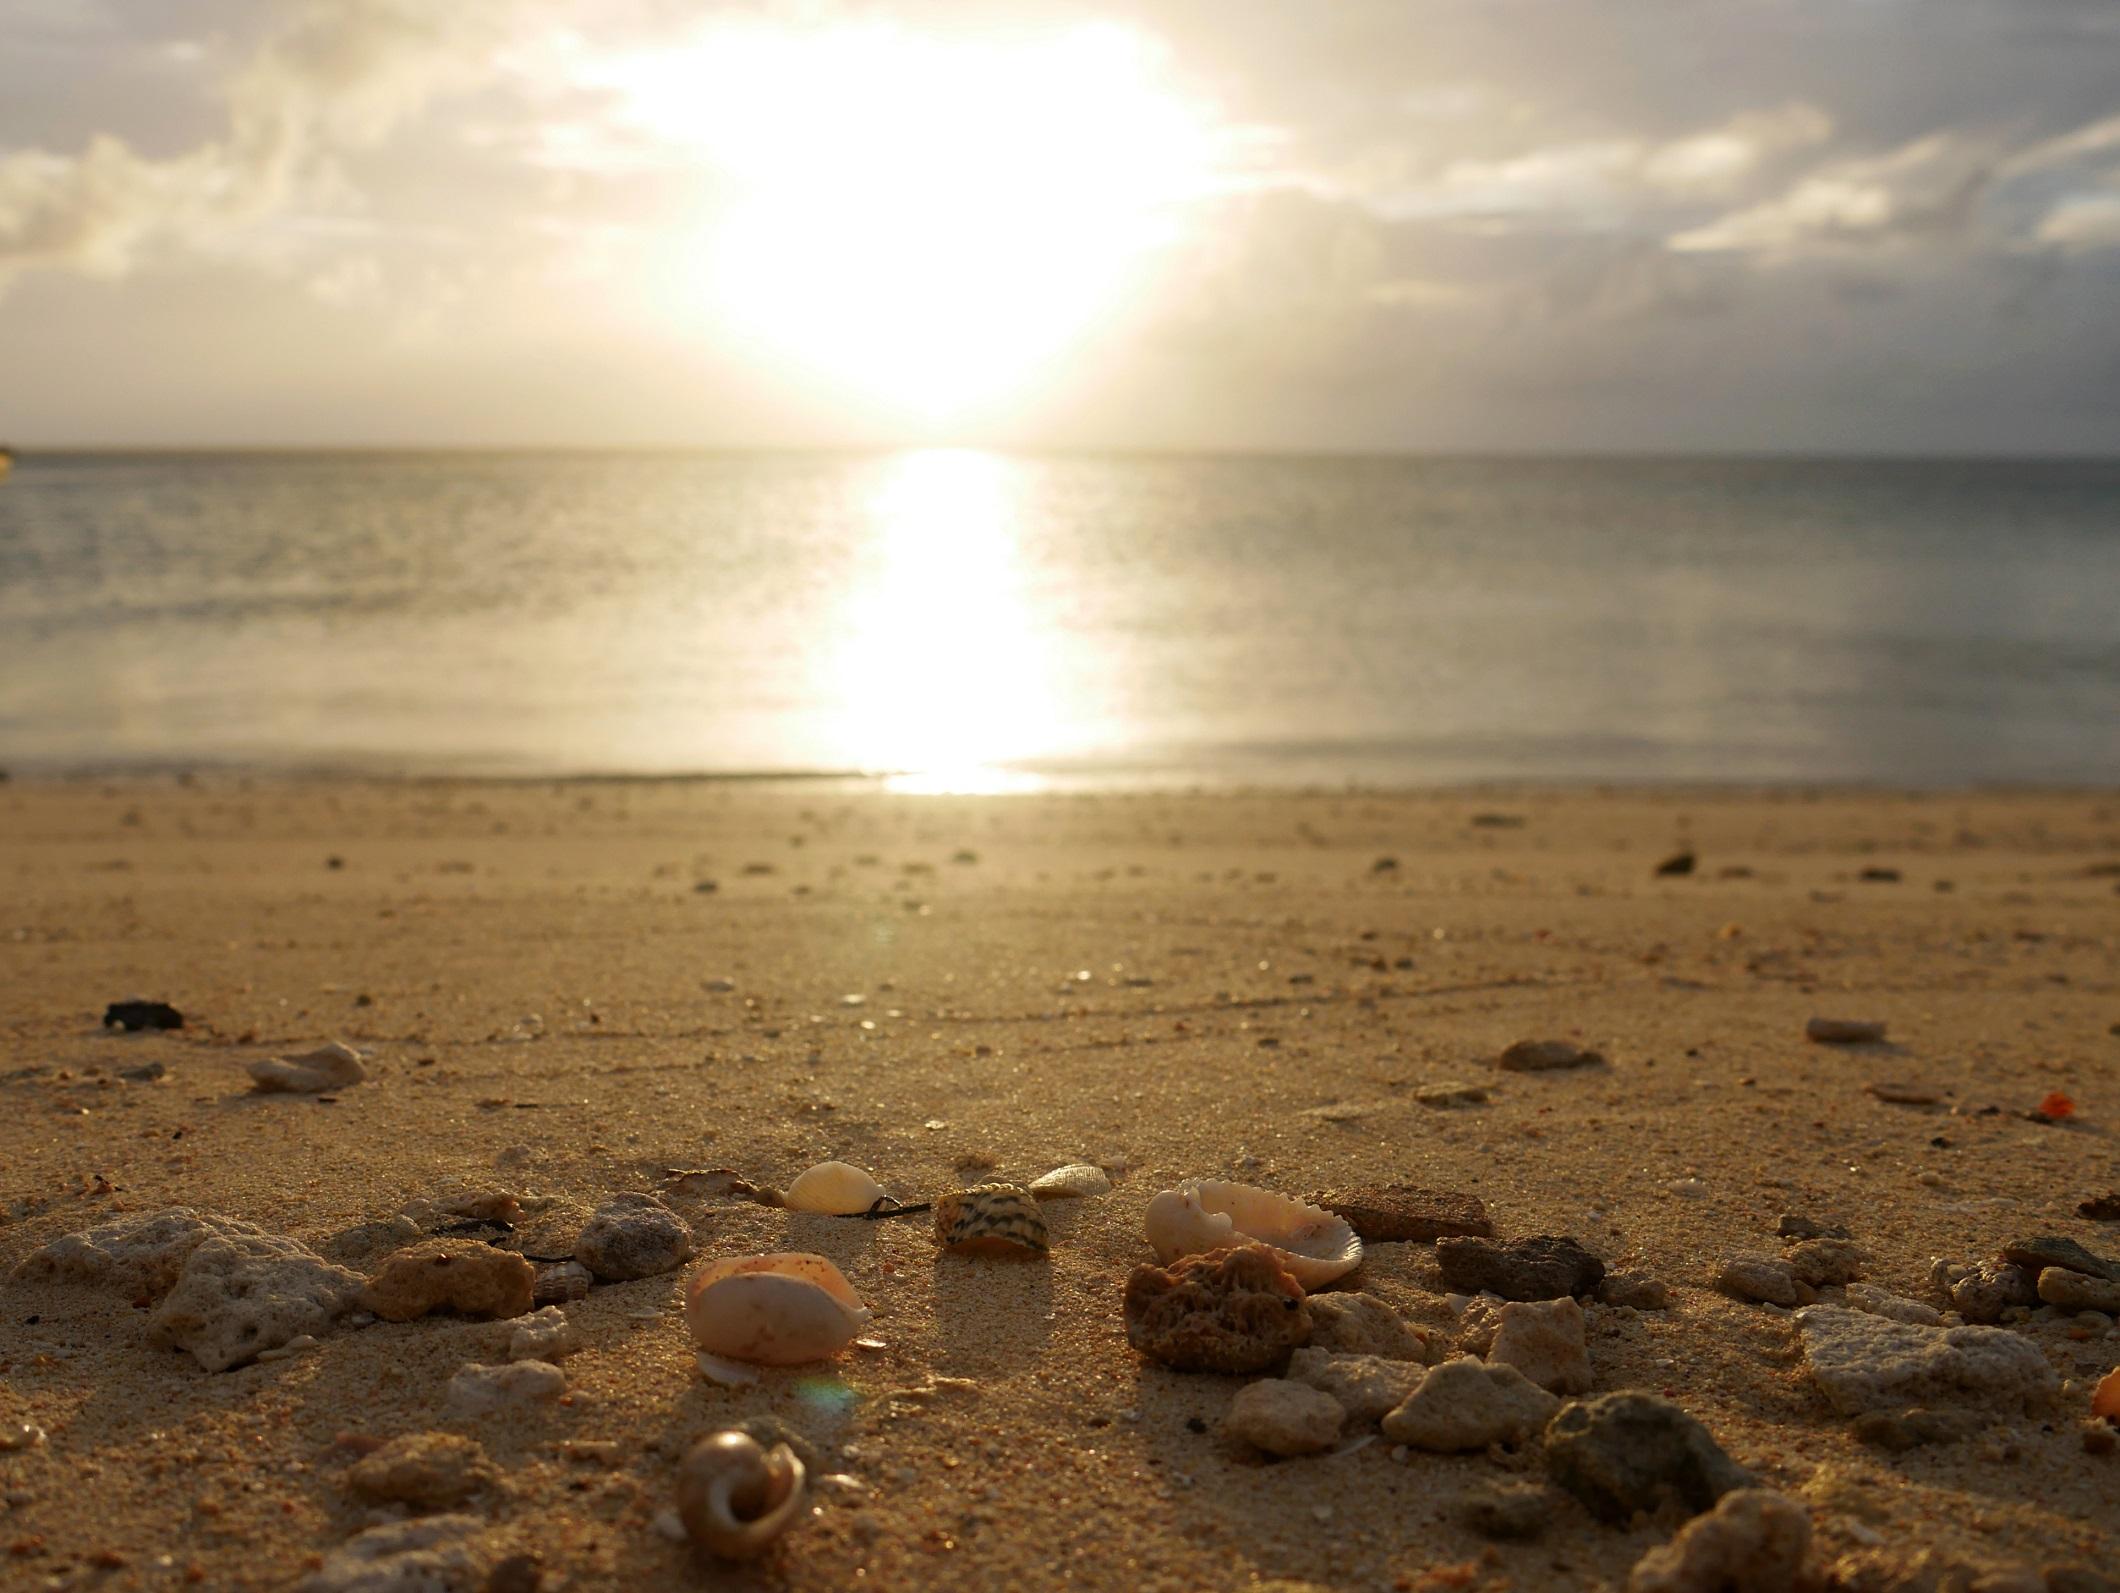 Sunset Seashells - Green Turtle Cay, Abaco, Bahamas